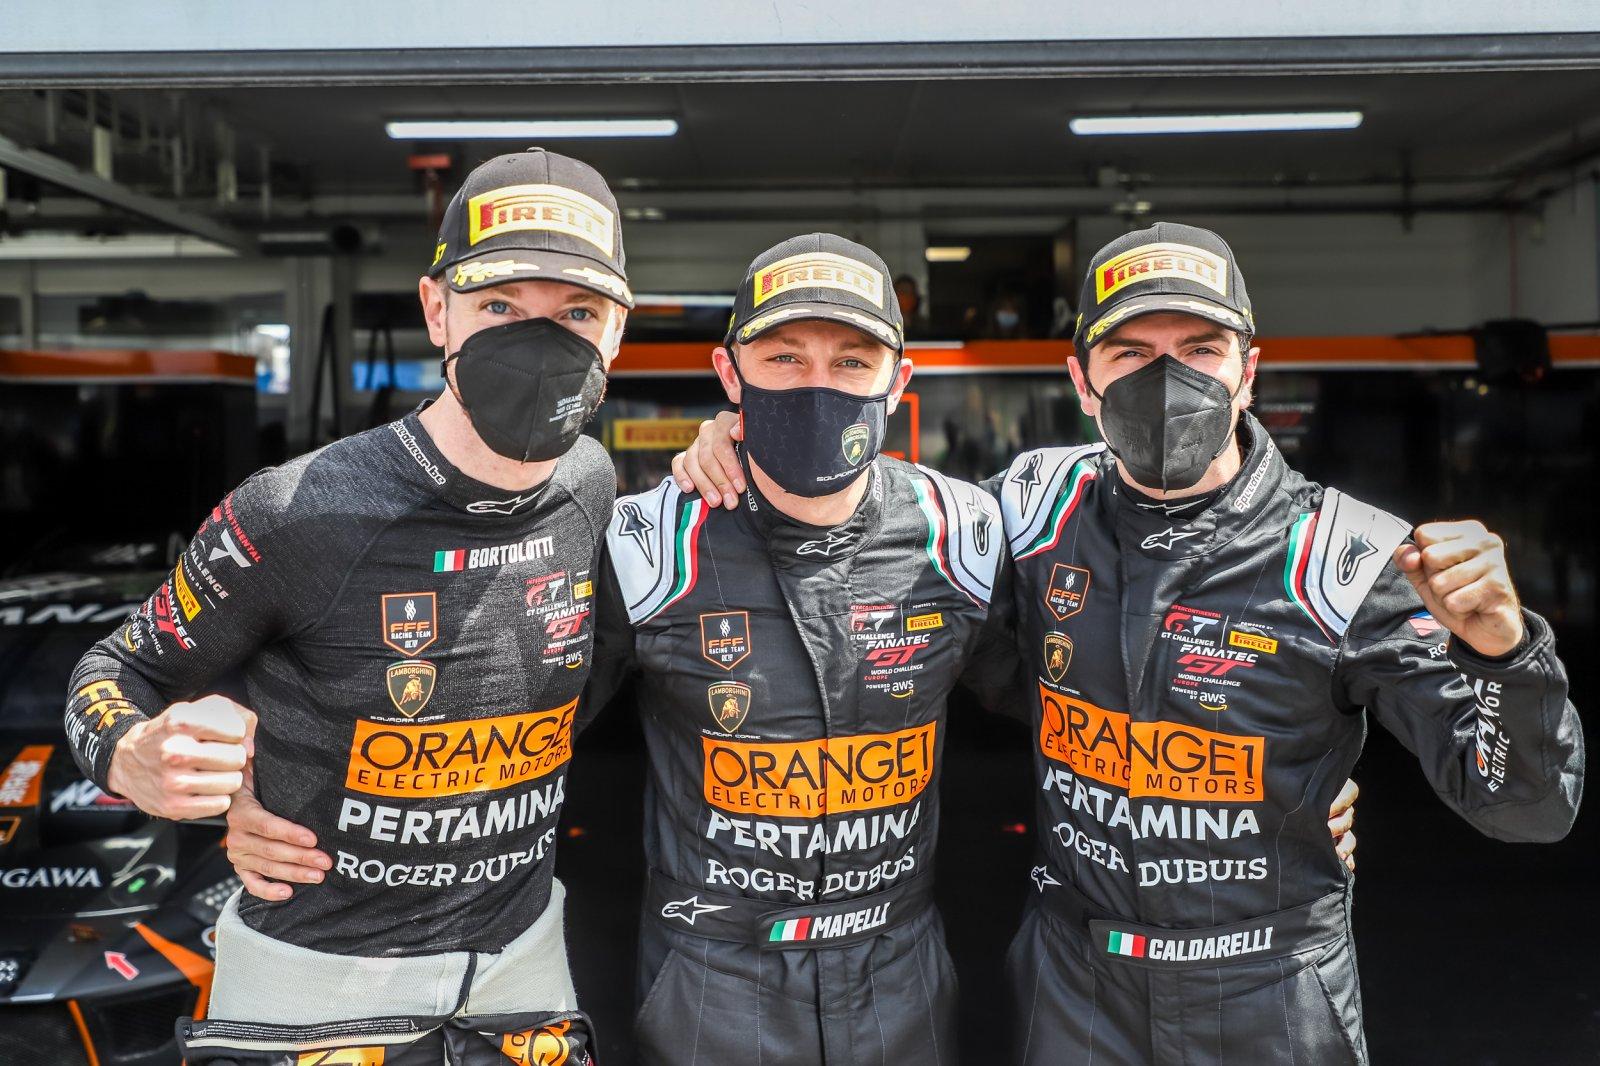 Orange1 FFF Racing Lamborghini on top at Circuit Paul Ricard to secure second successive Endurance Cup pole